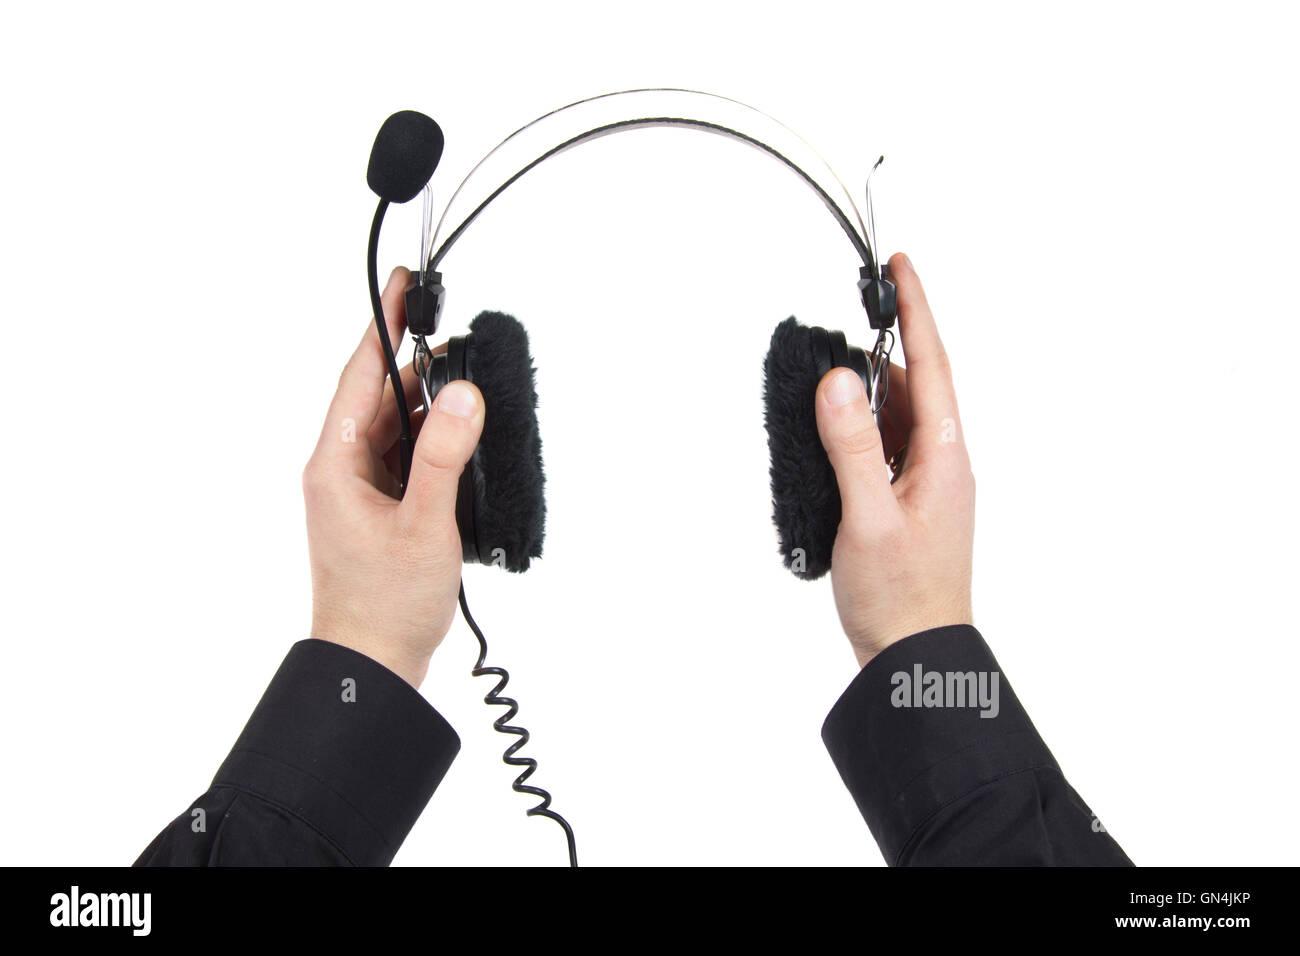 man holding nice headphones - Stock Image